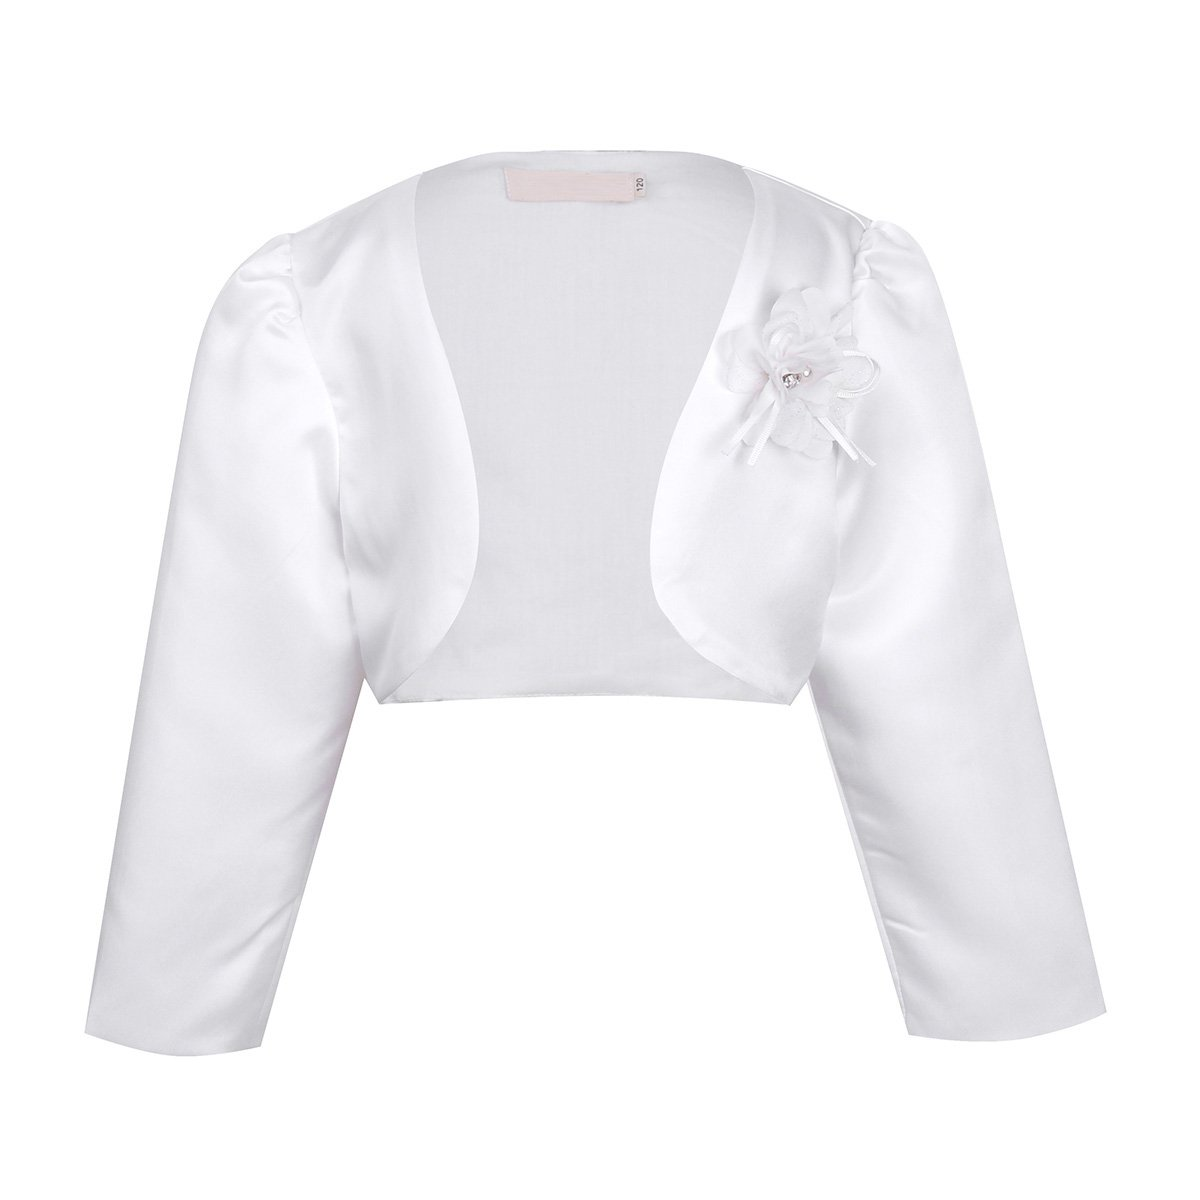 iEFiEL Girls Long Sleeves Bolero Jacket Shrug Short Cardigan Sweater Dress Cover Up Off-White 18-24 Months